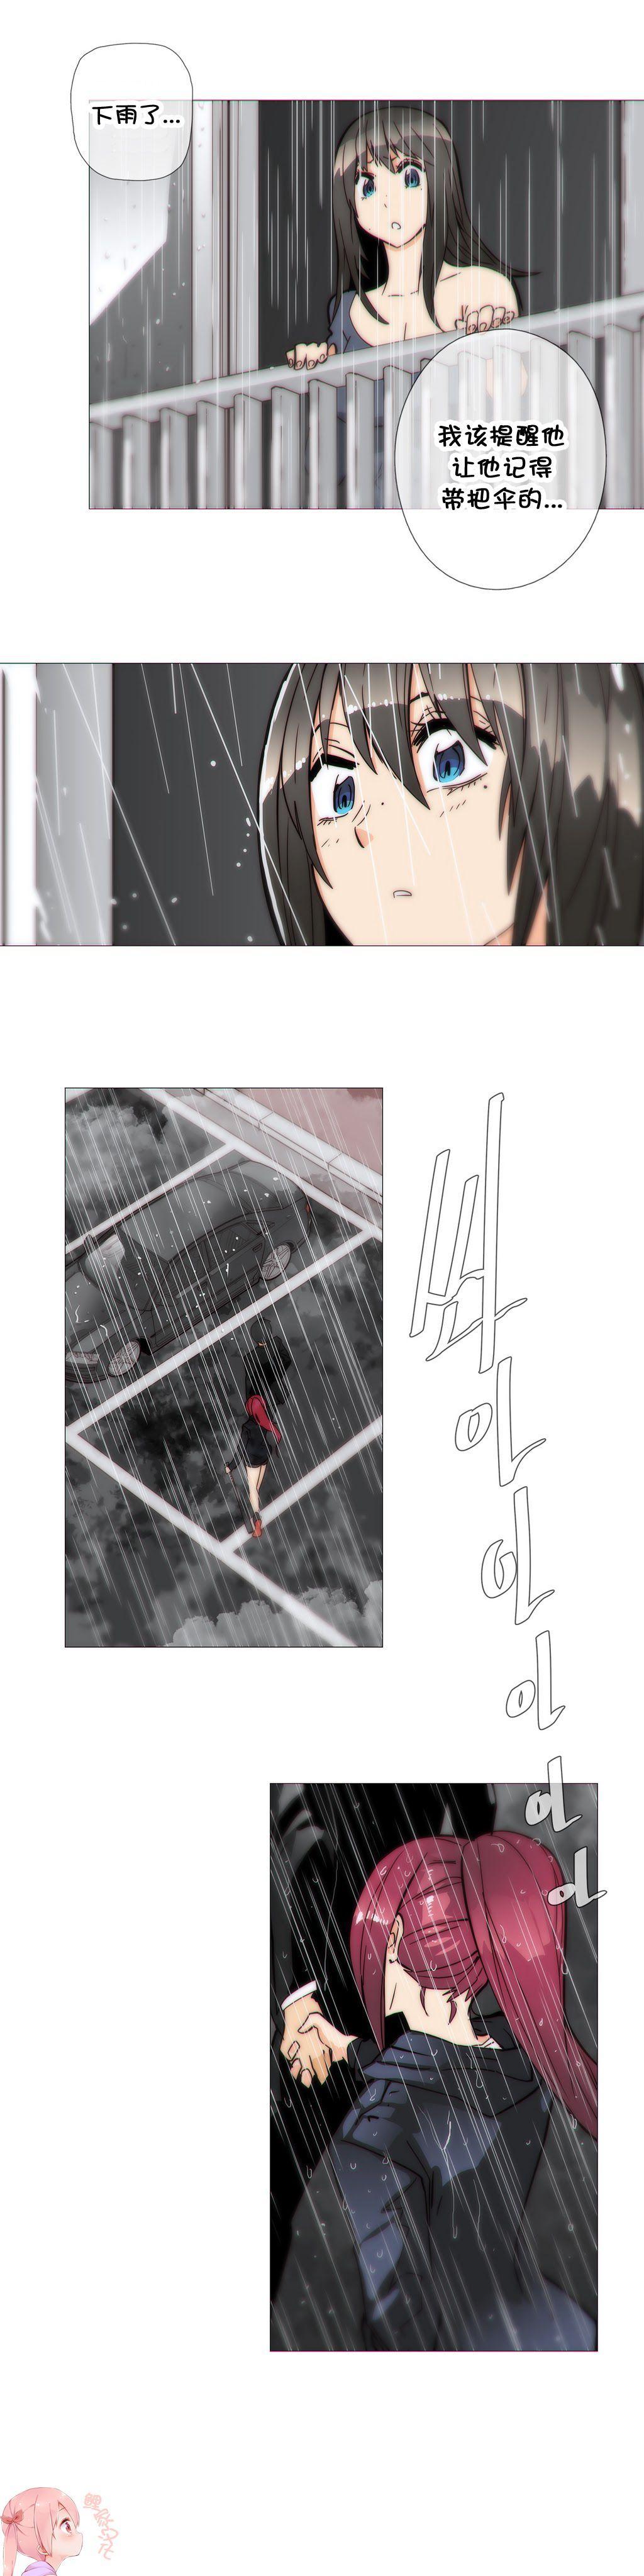 HouseHold Affairs 【卞赤鲤个人汉化】1~33话(持续更新中) 727